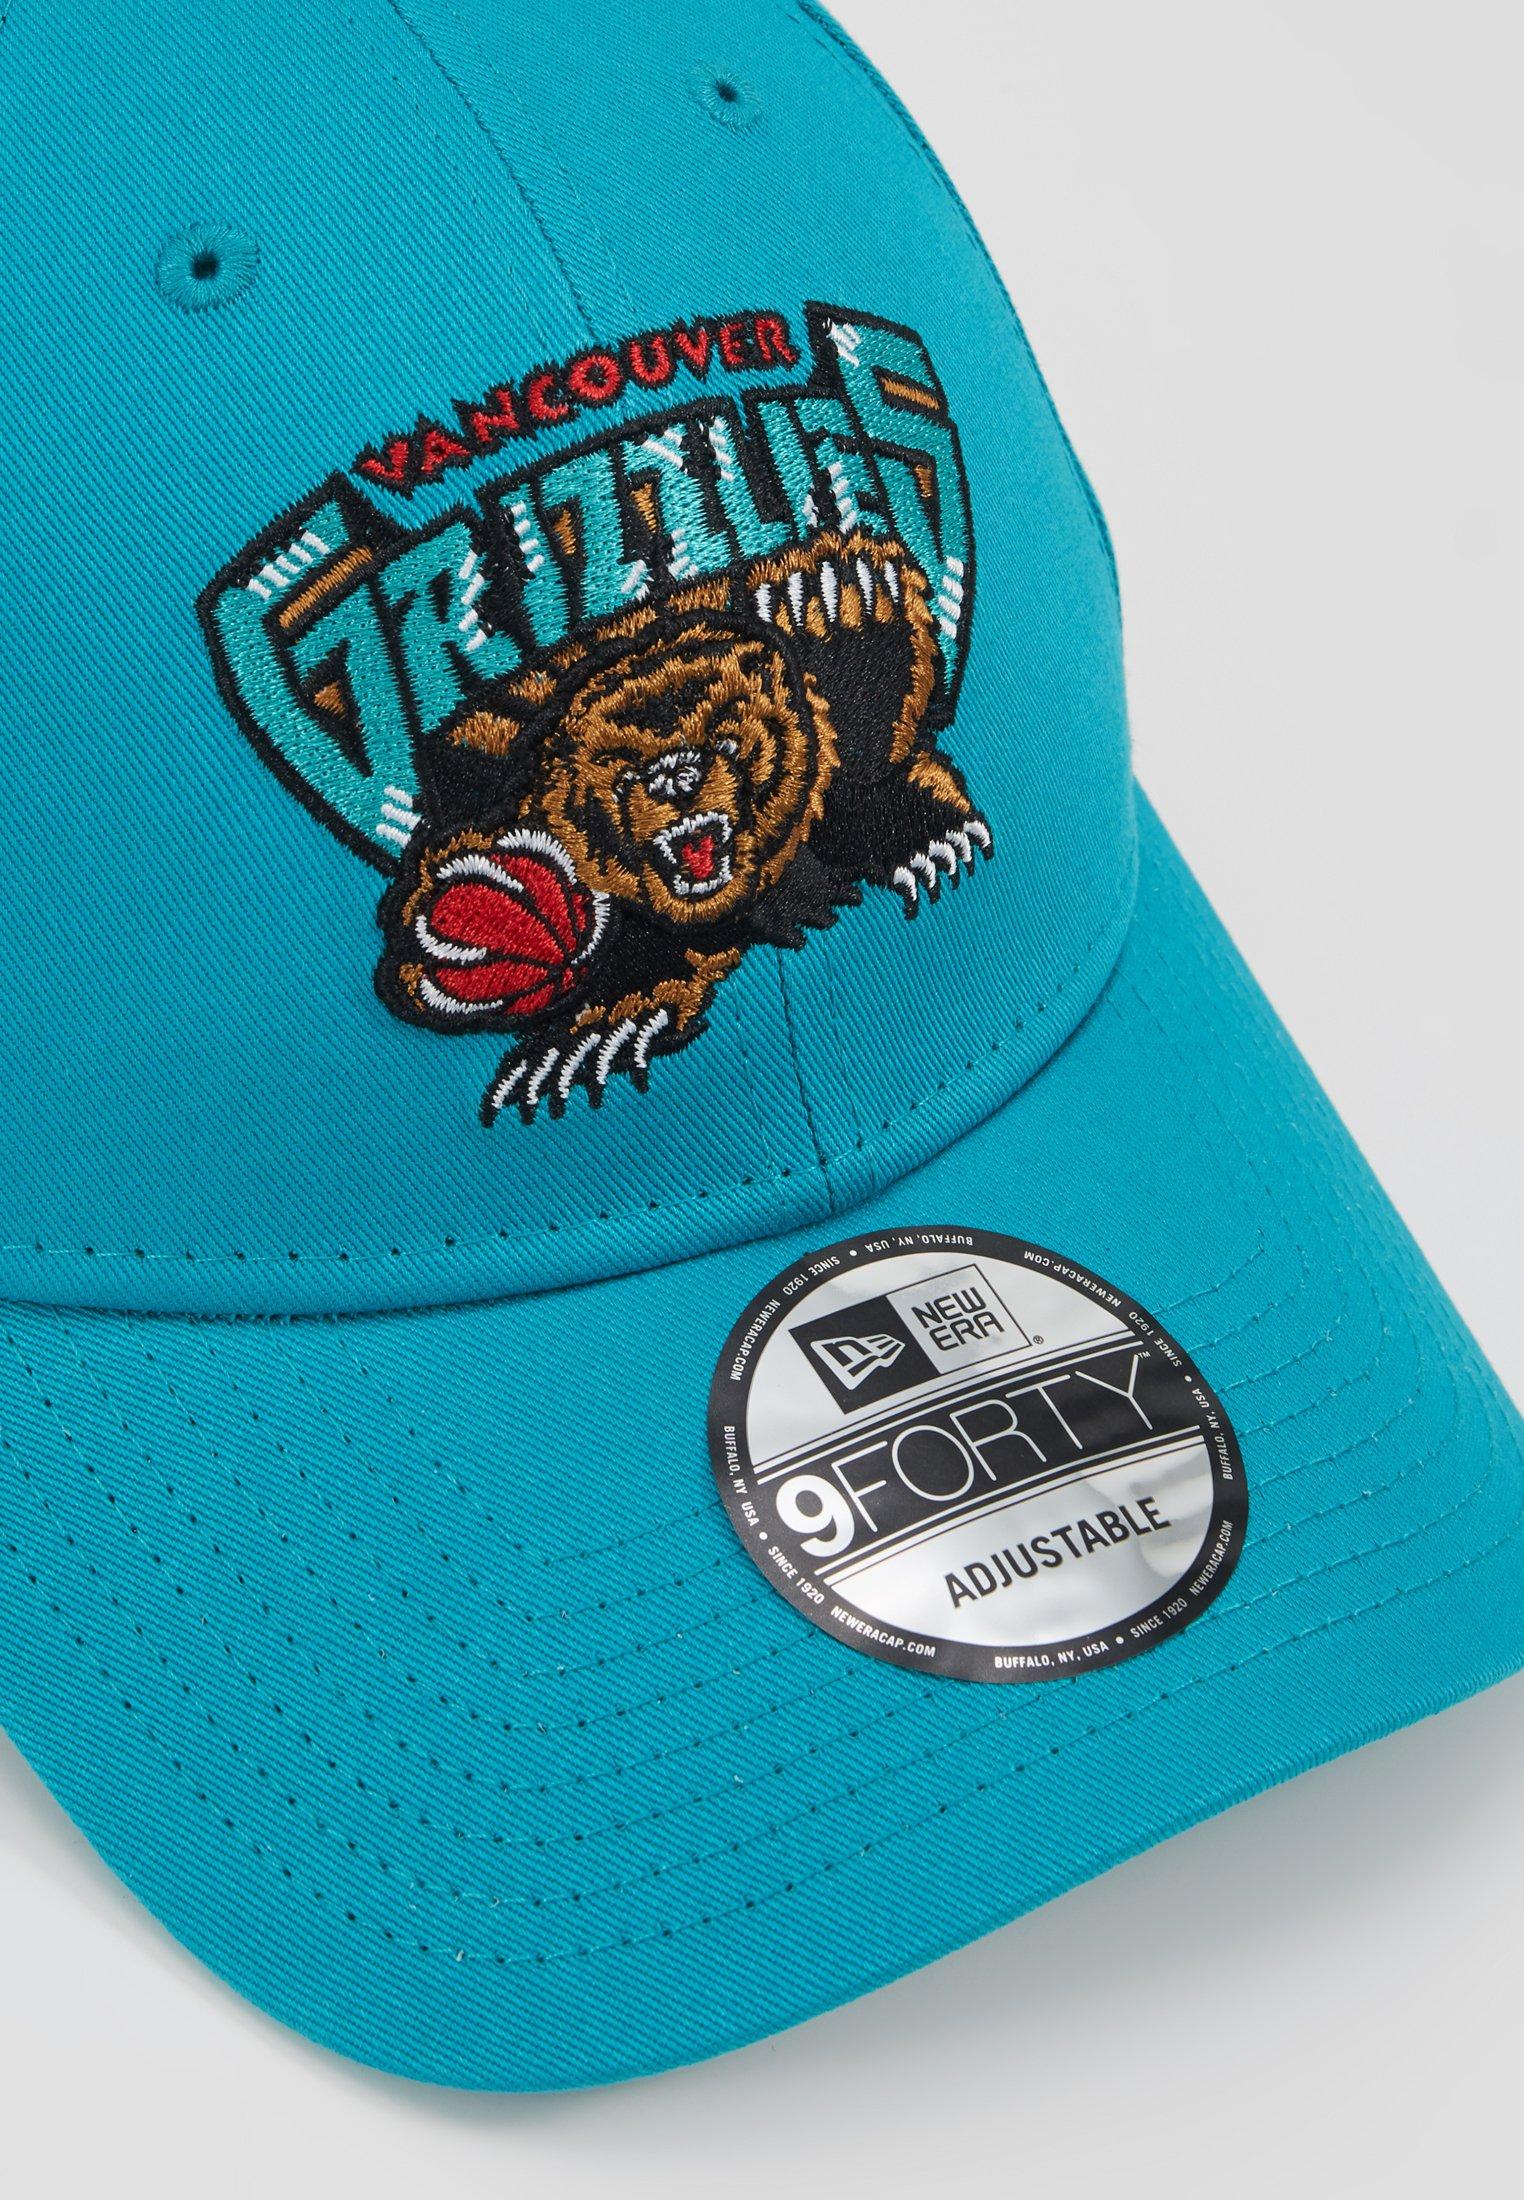 New Era Nba Memphis Grizzlies Hardwood Classics Nights Series Forty - Cap Mottled Teal/petrol Meliert